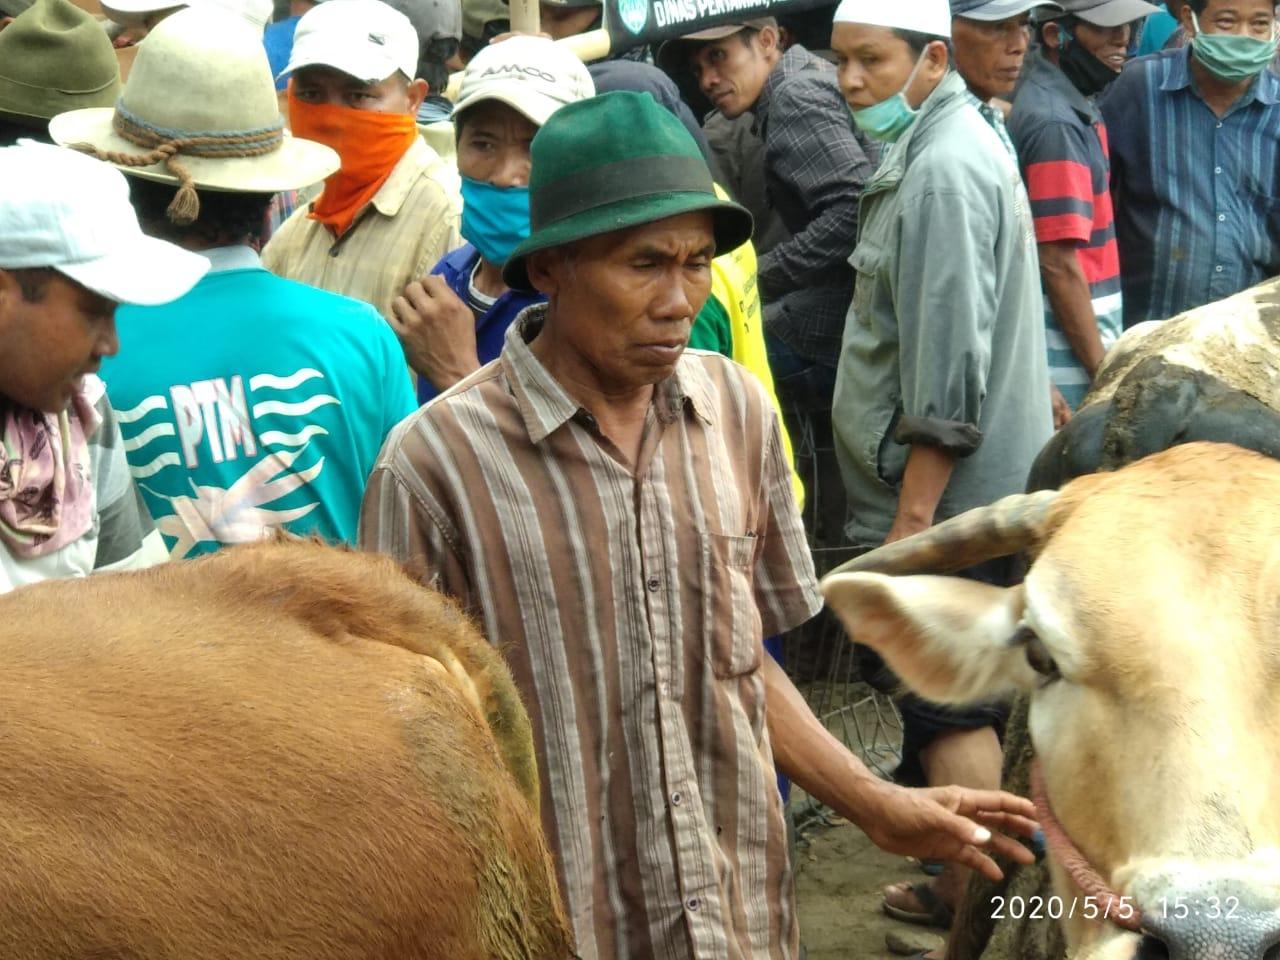 Antisipasi Penyebaran Covid-19 Pasar Hewan Wonoasih Ditutup Pemkot Probolinggo, Perkumpulan Pedagang Sapi Buka Pasar Hewan Swasta